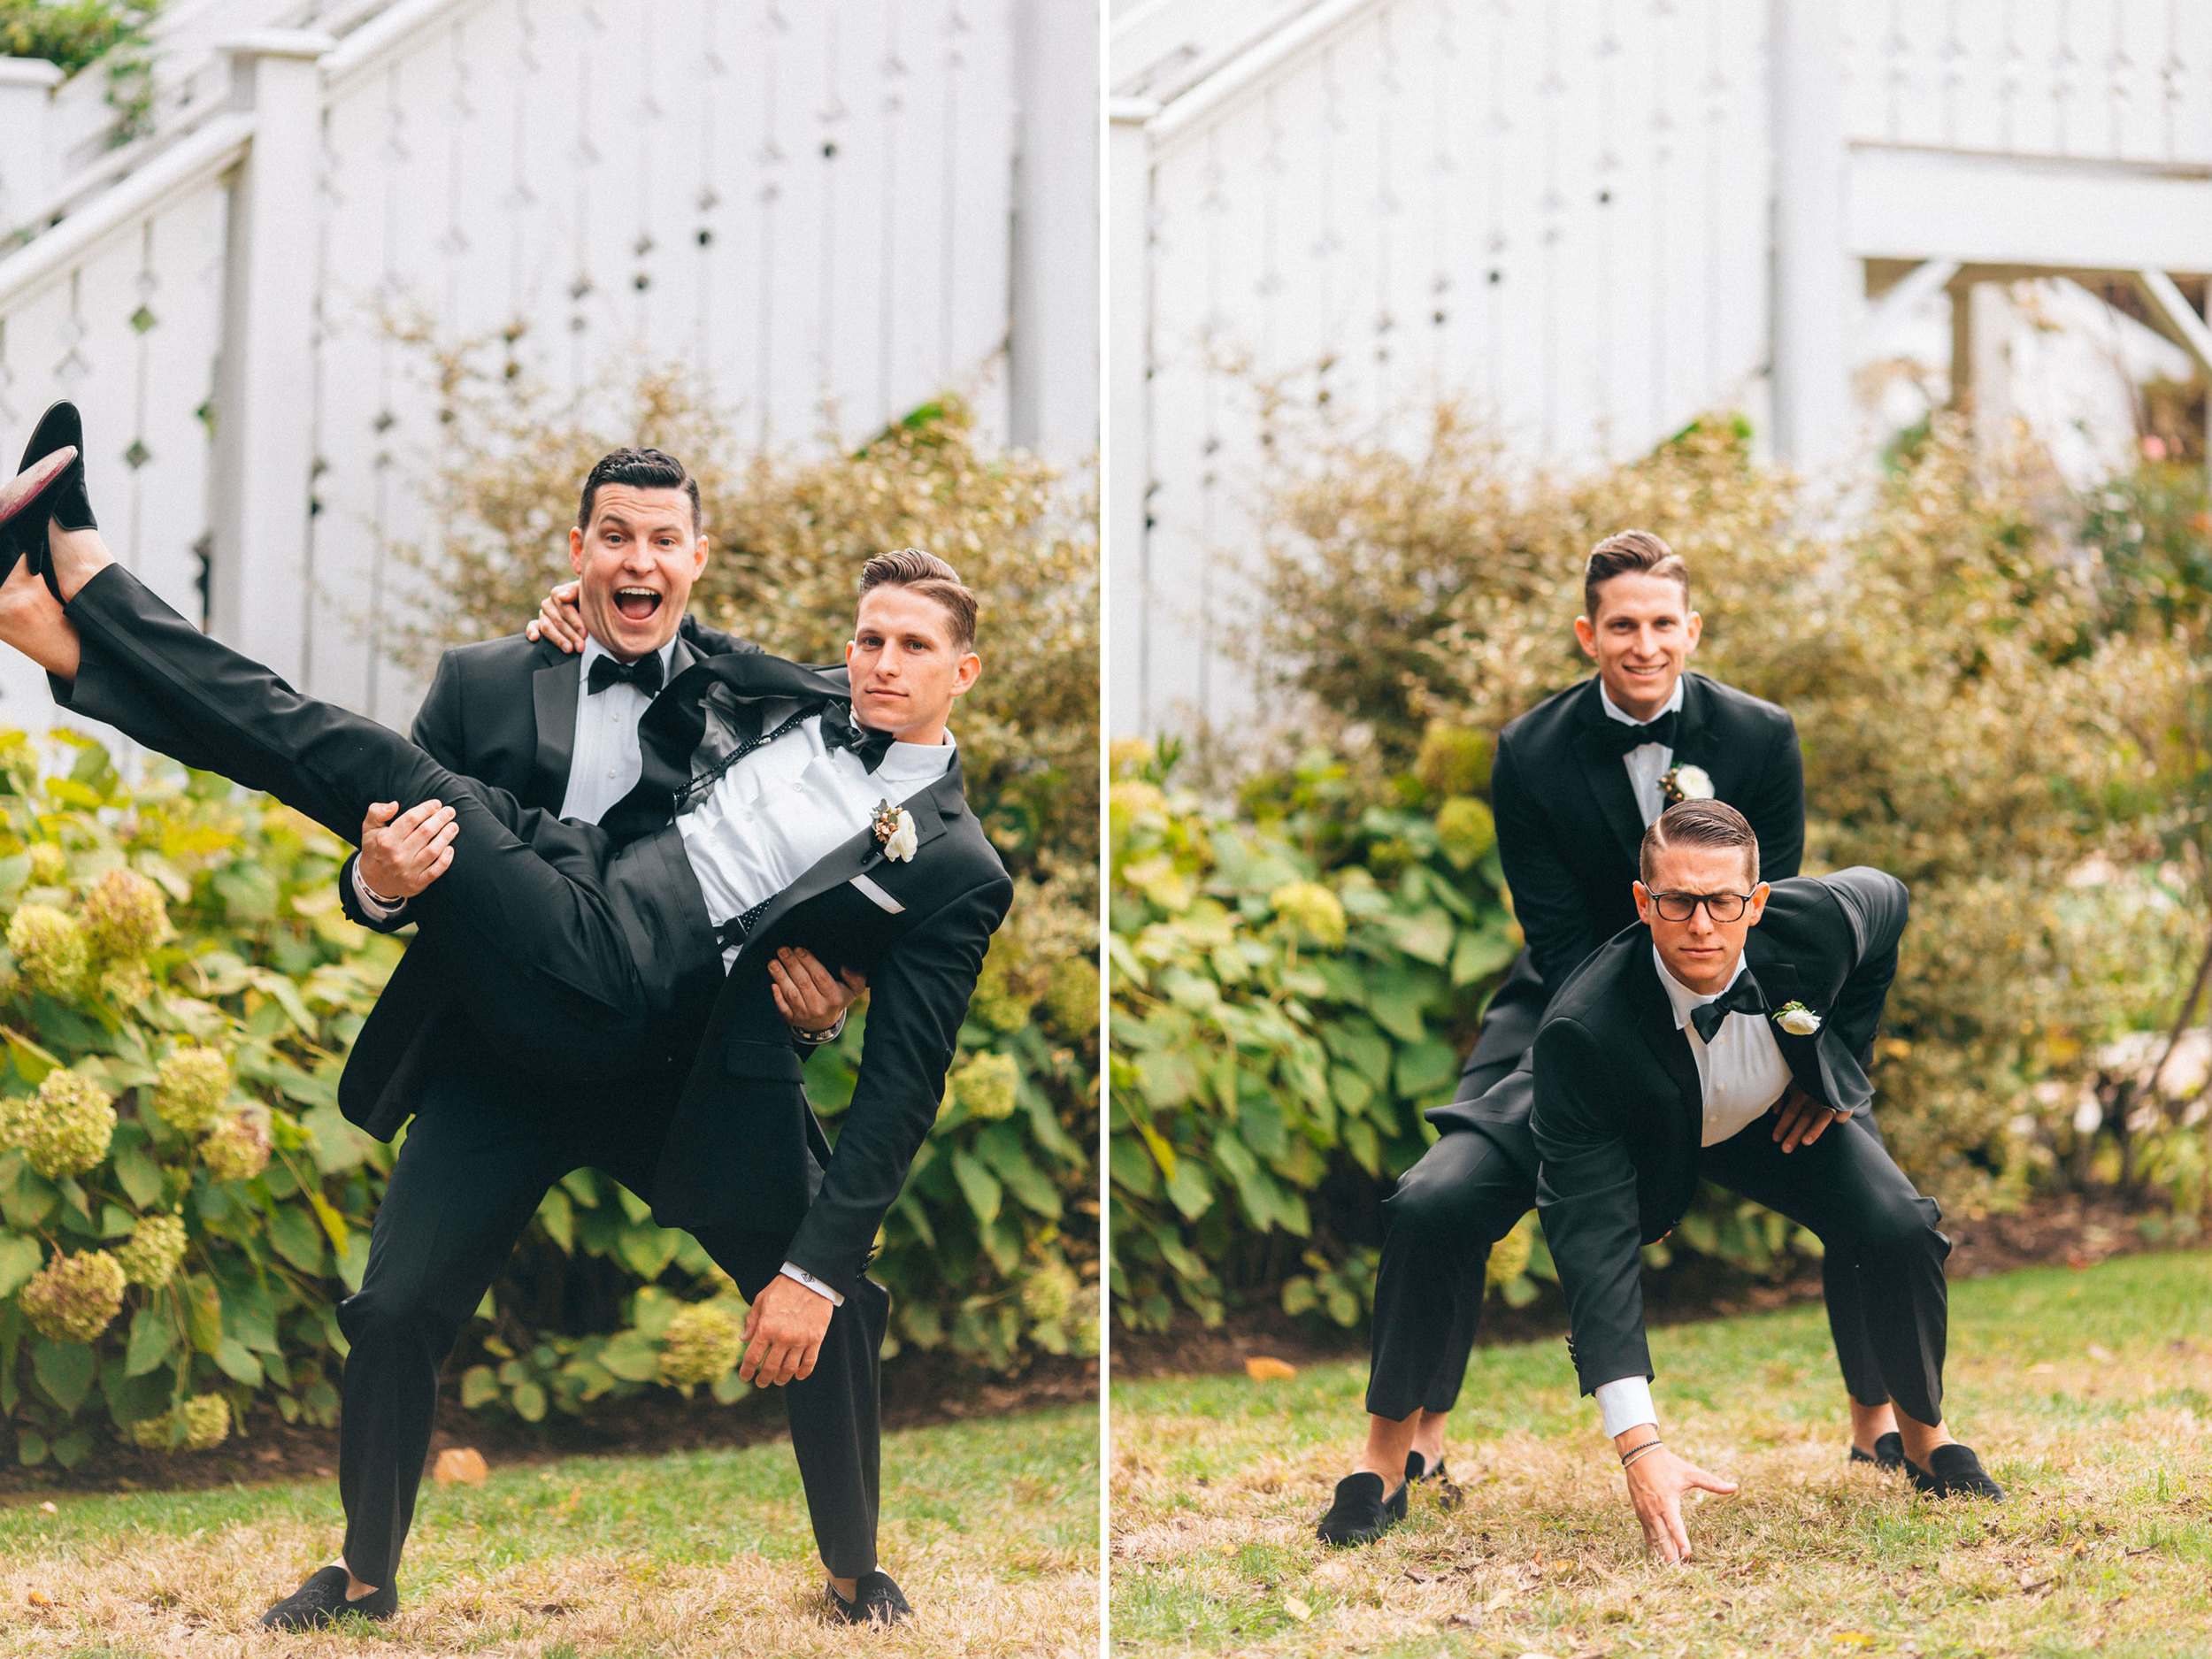 Me & Mr. Jones Wedding, Funny Groomsmen Pictures, Black Tie Wedding, Calvin Klein Slim Fit Black Tuxedos